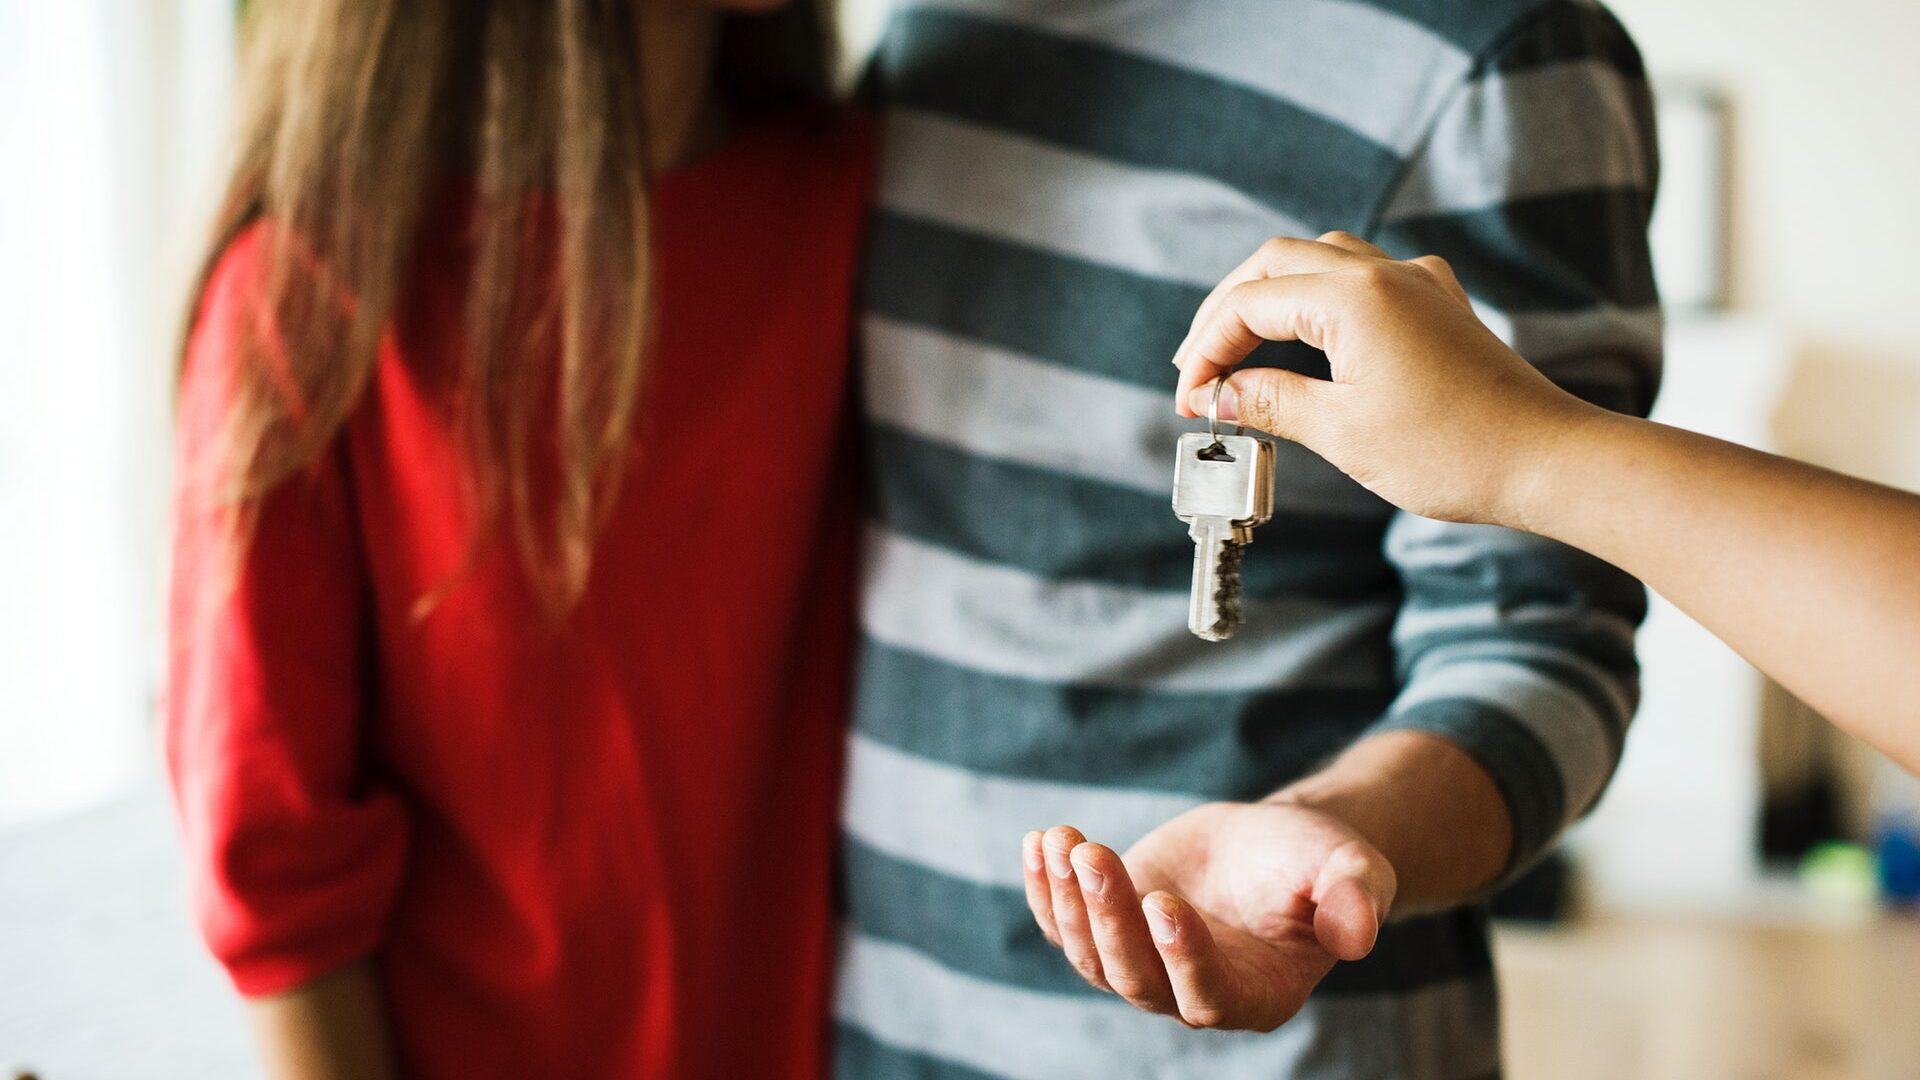 bastman properties keys